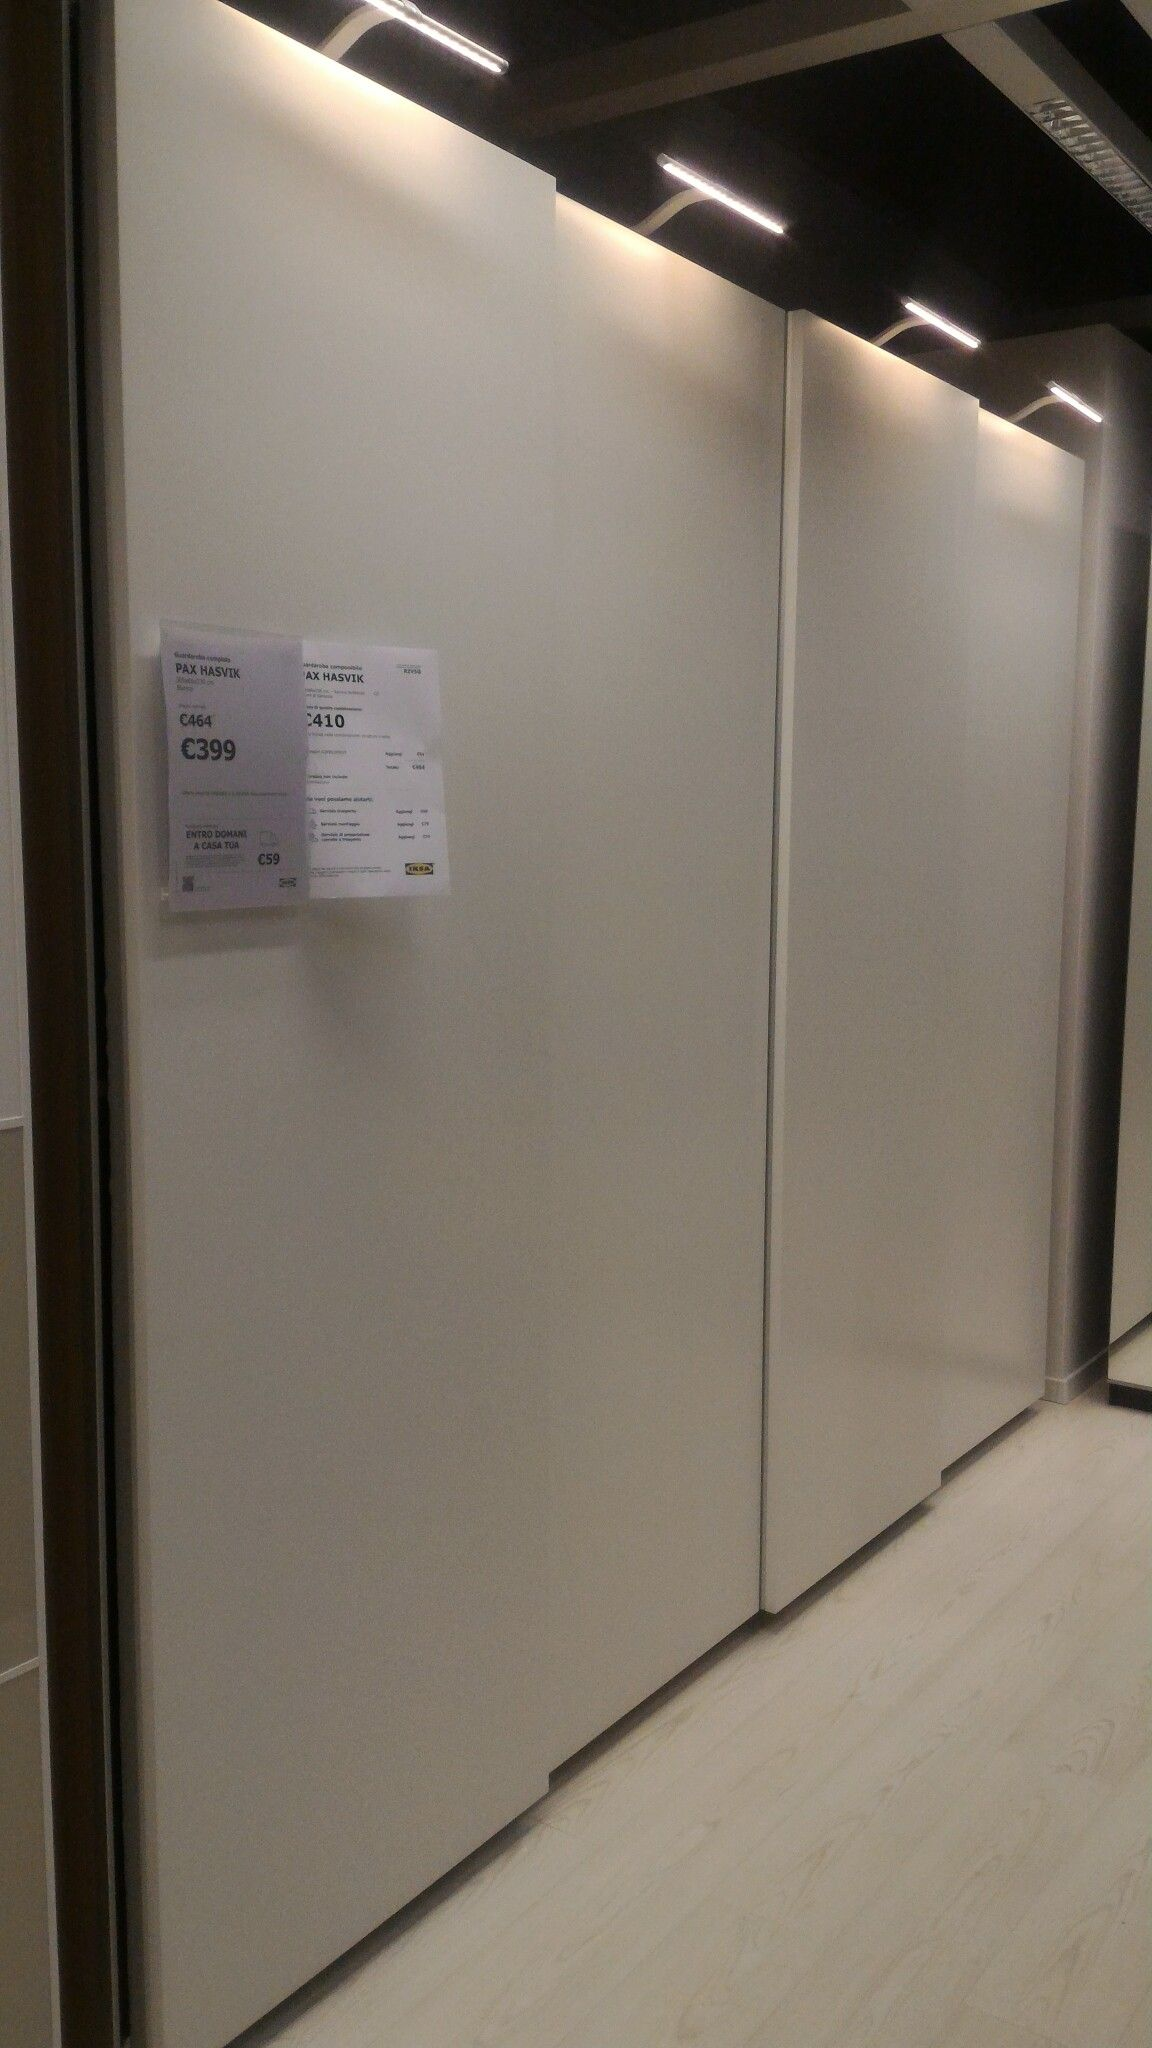 IKEA PAX Hasvik guardaroba bianco con ante scorrevoli